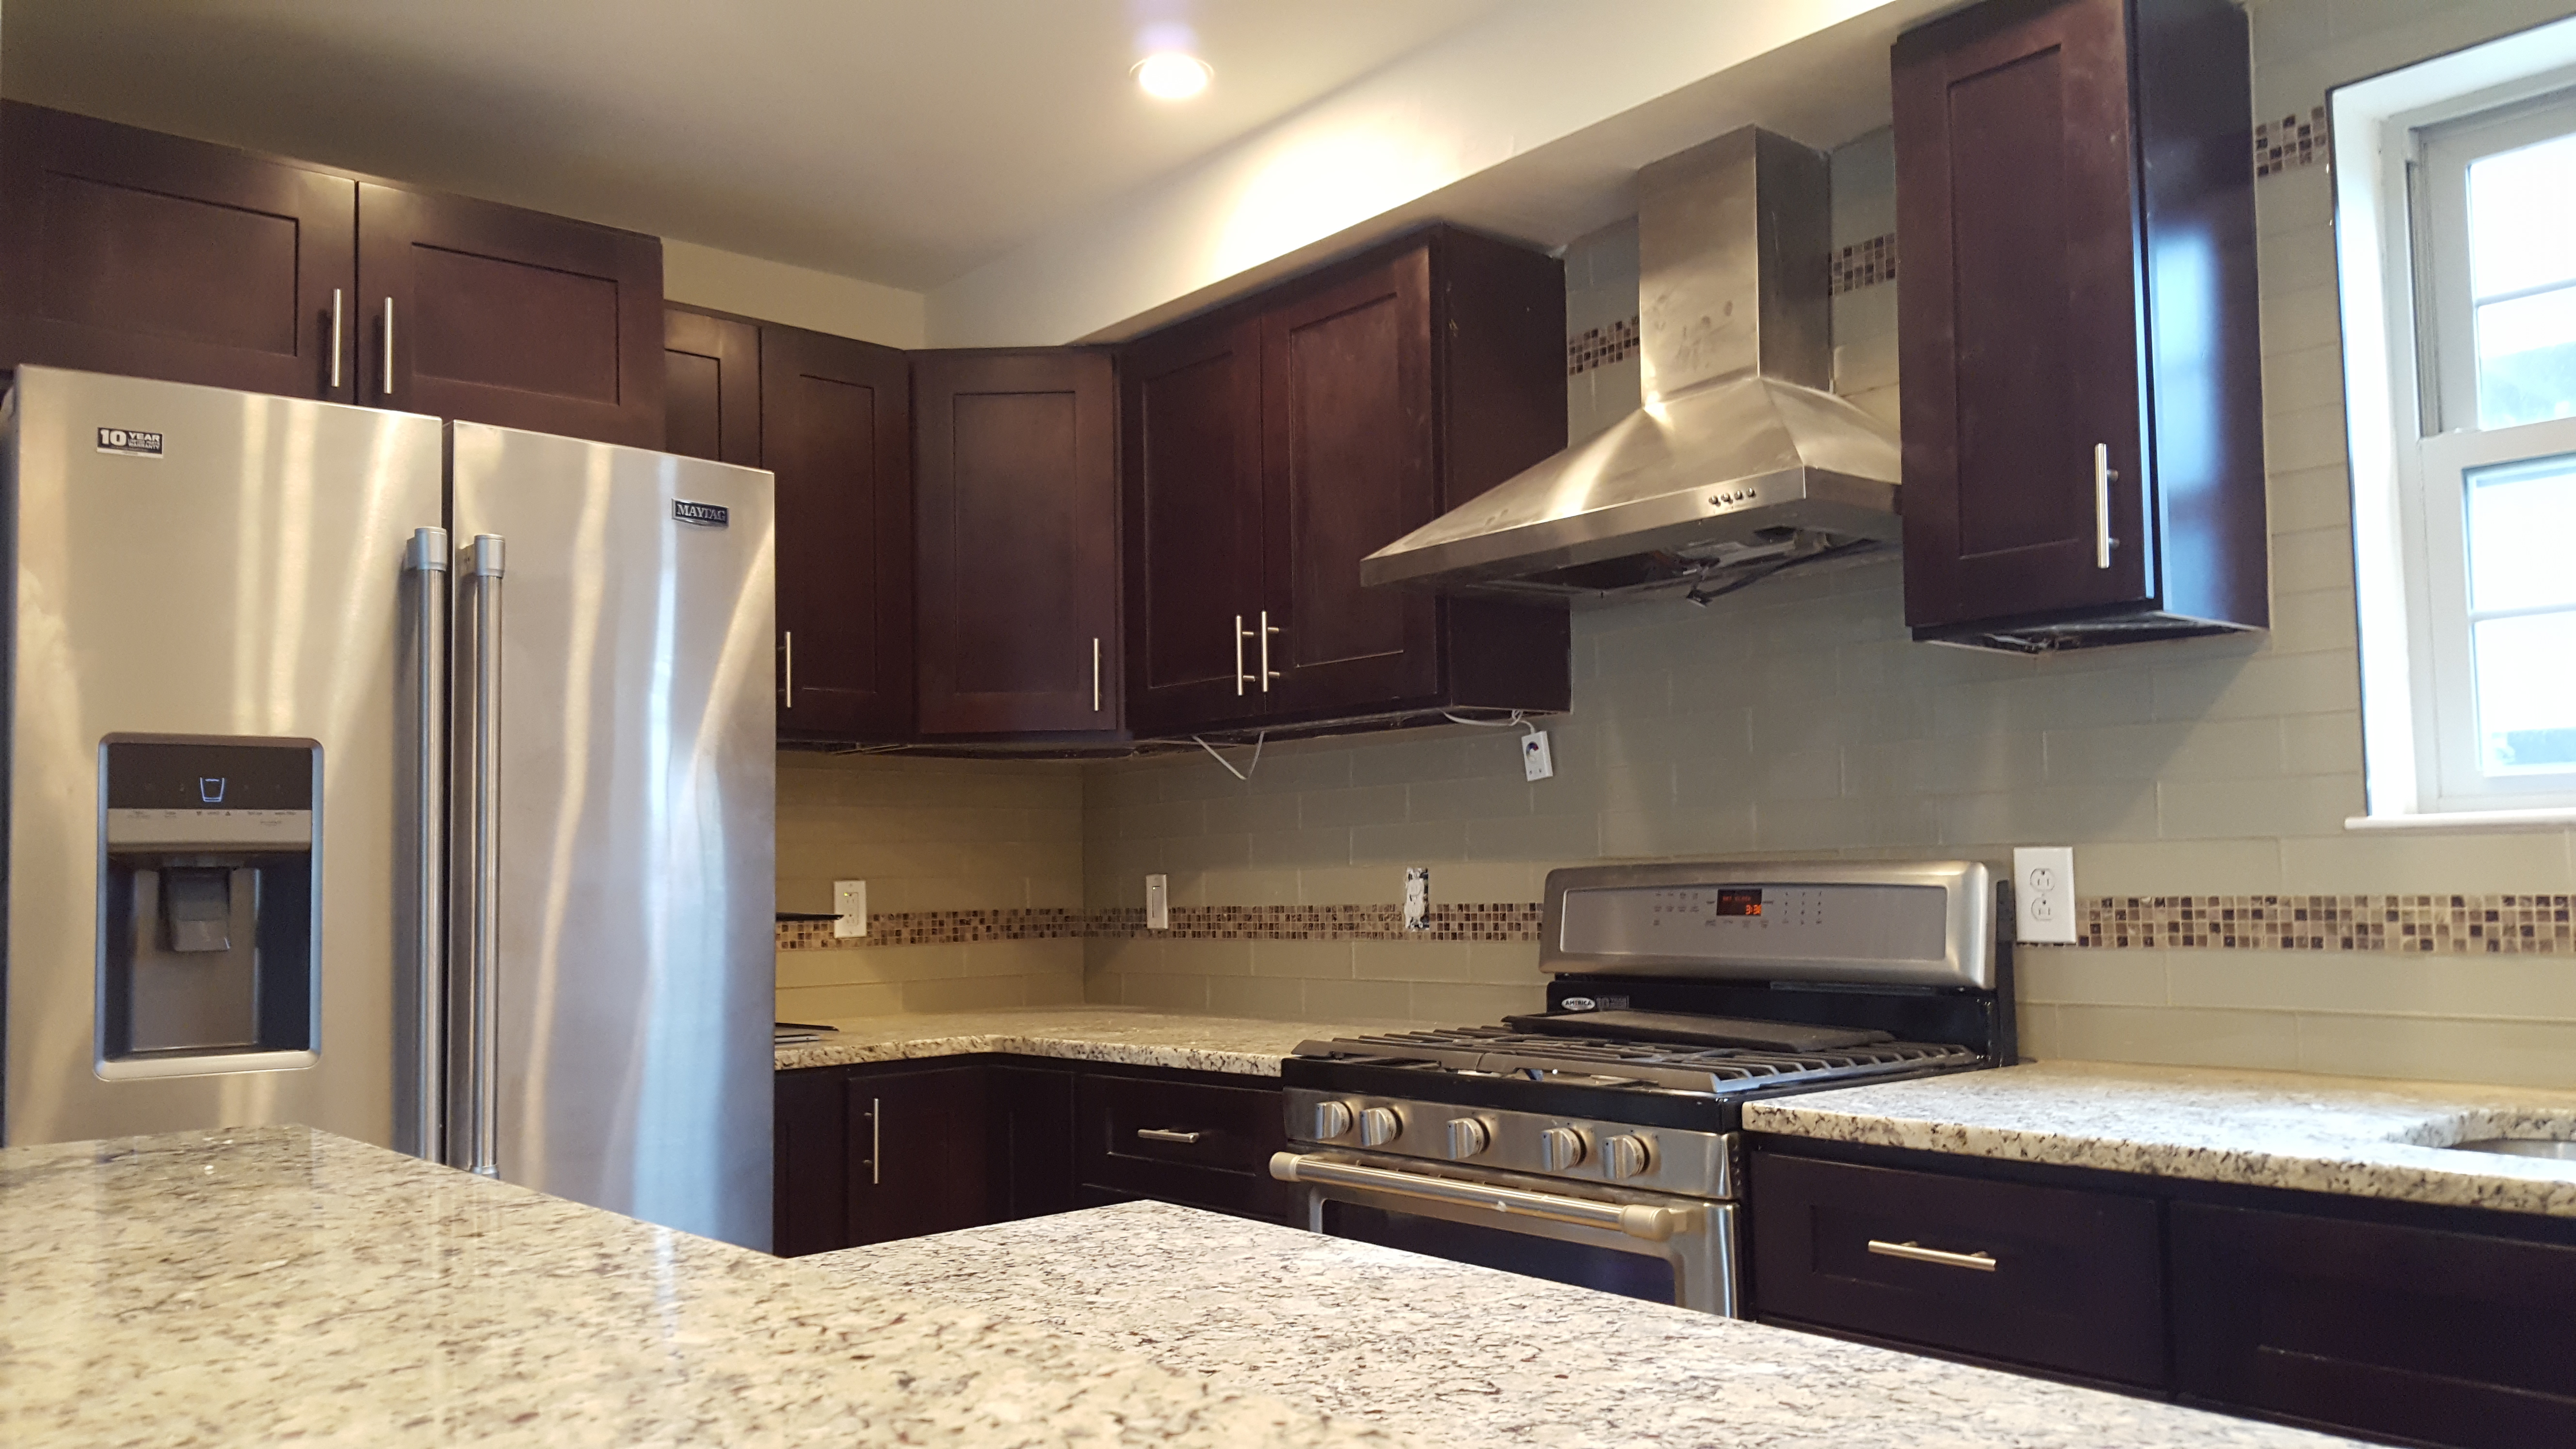 Kitchen Cabinet Warehouse 6 Reasons To Buy RTA Kitchen Cabinets   Kitchen CabiWarehouse